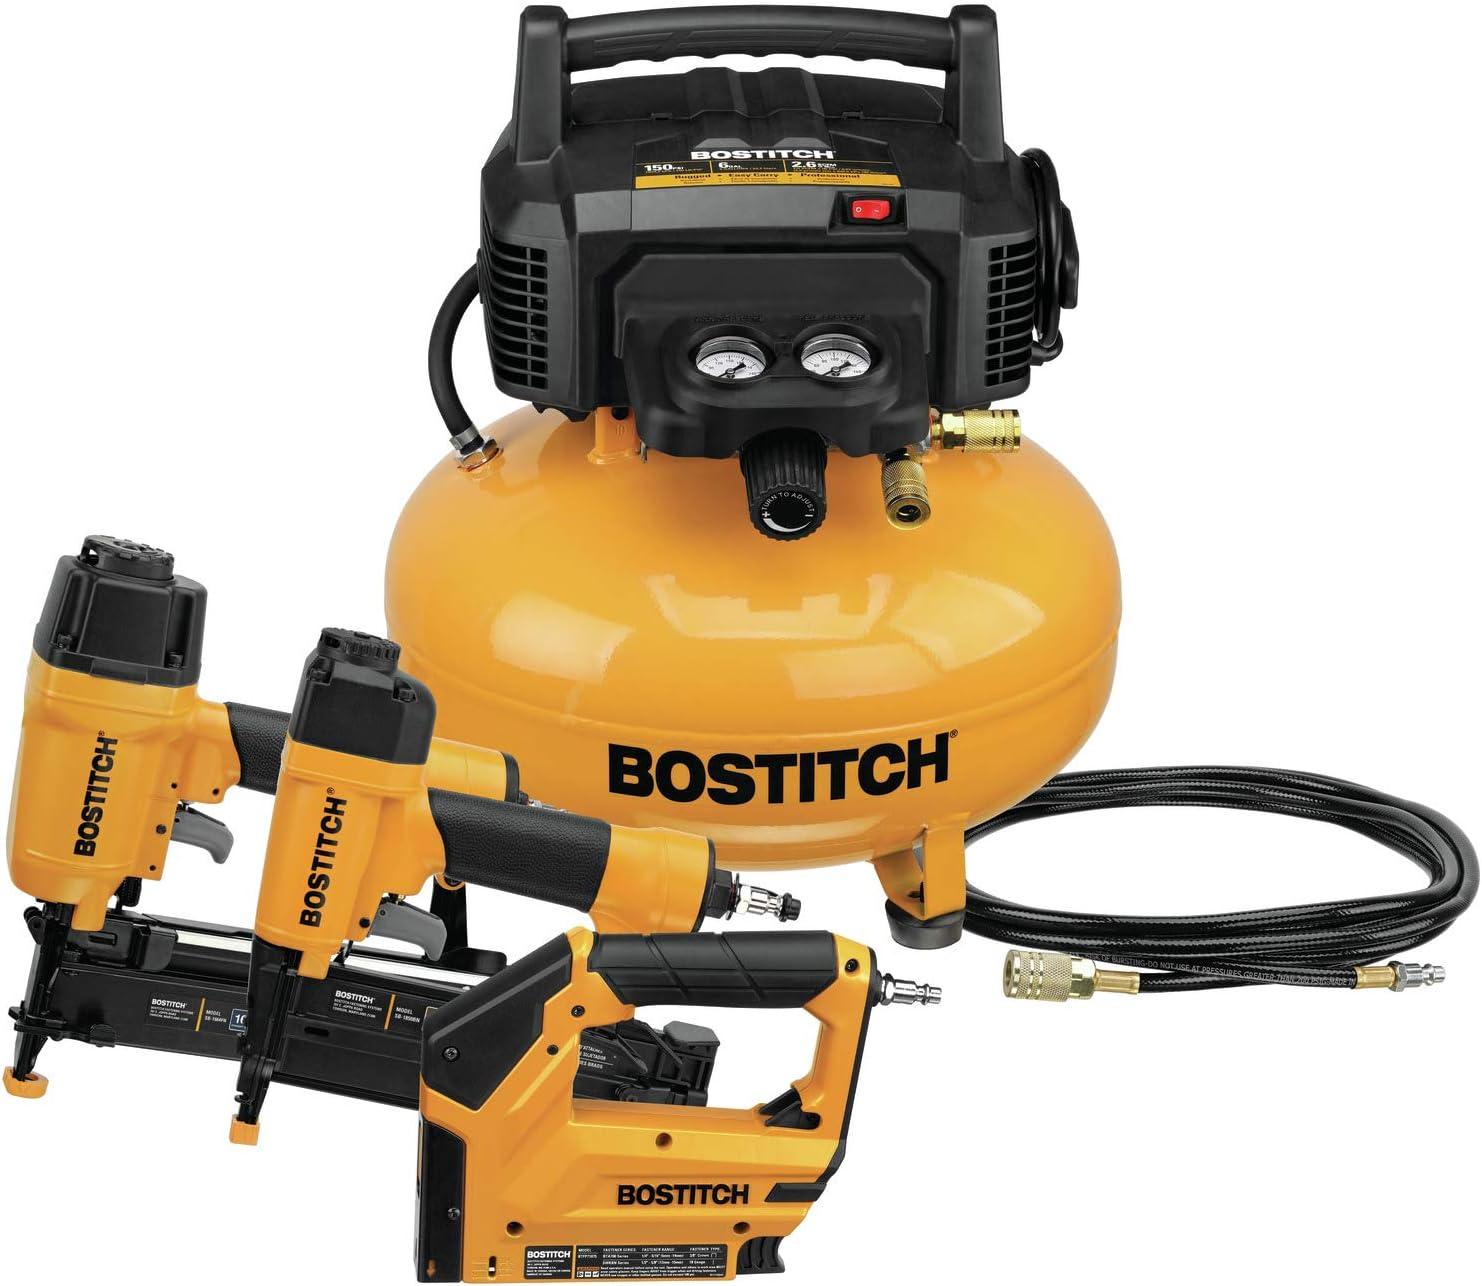 Bostitch空气压缩机组合套件